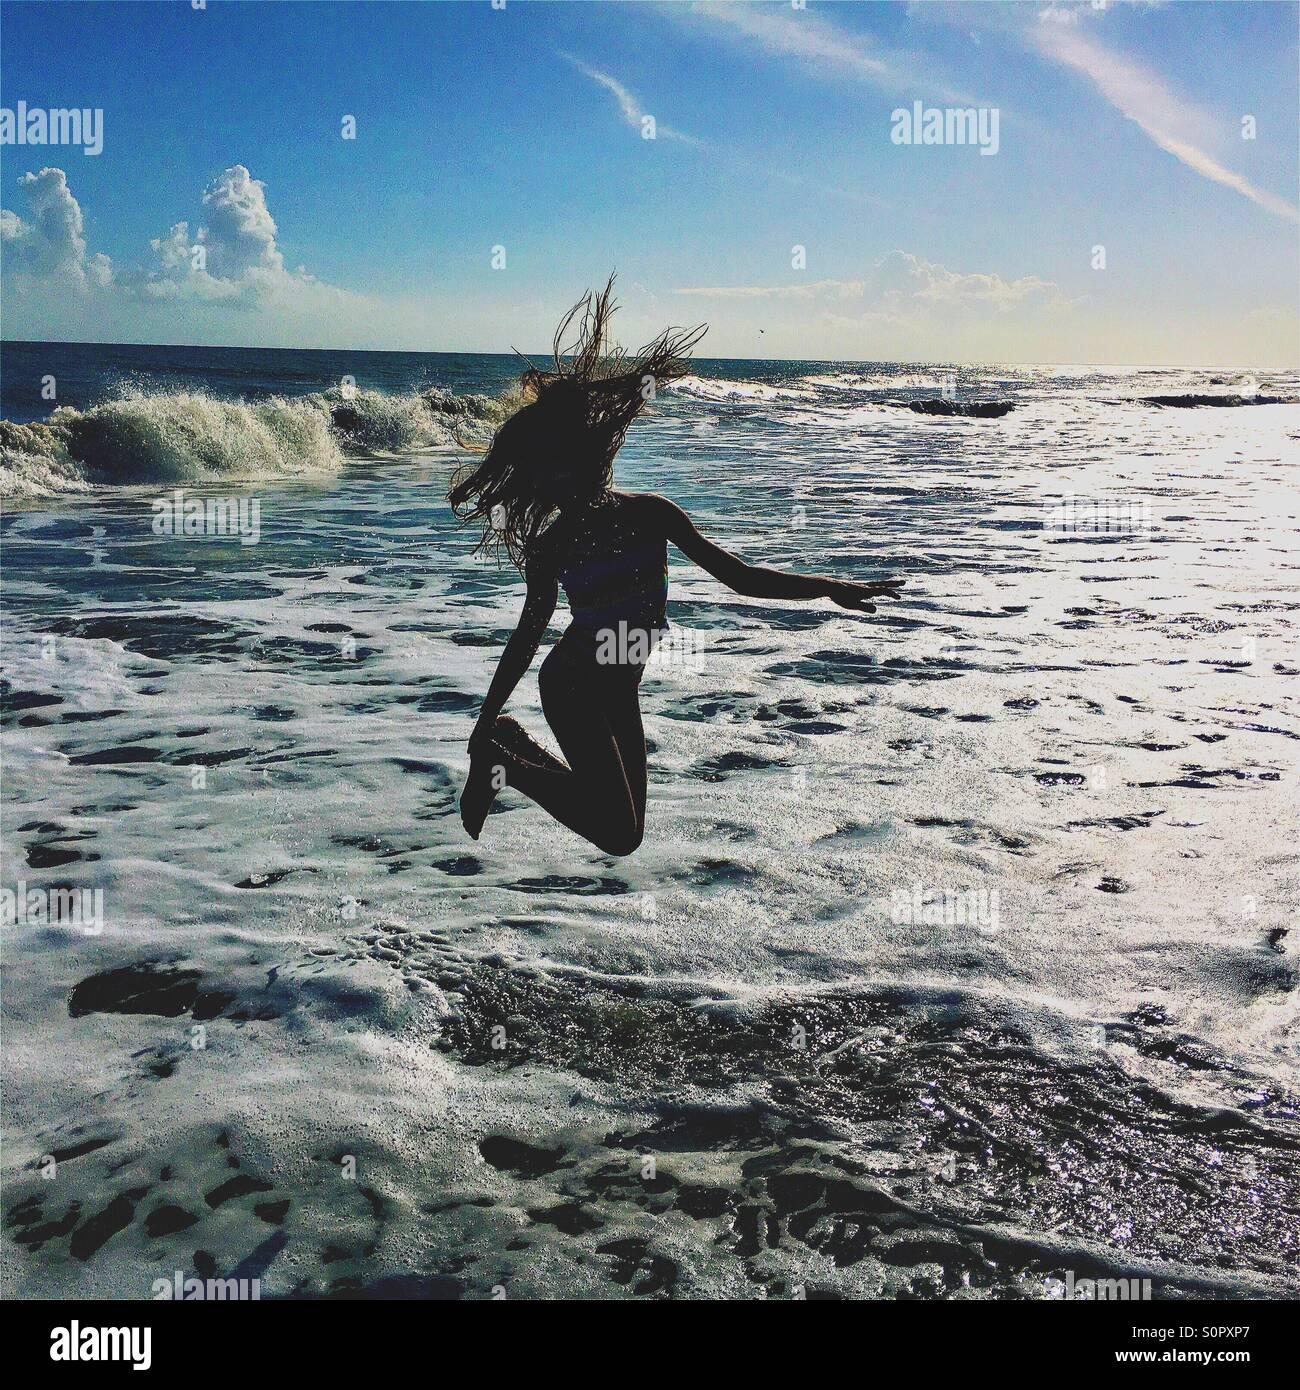 Mädchen in den Wellen des Ozeans springen Stockbild